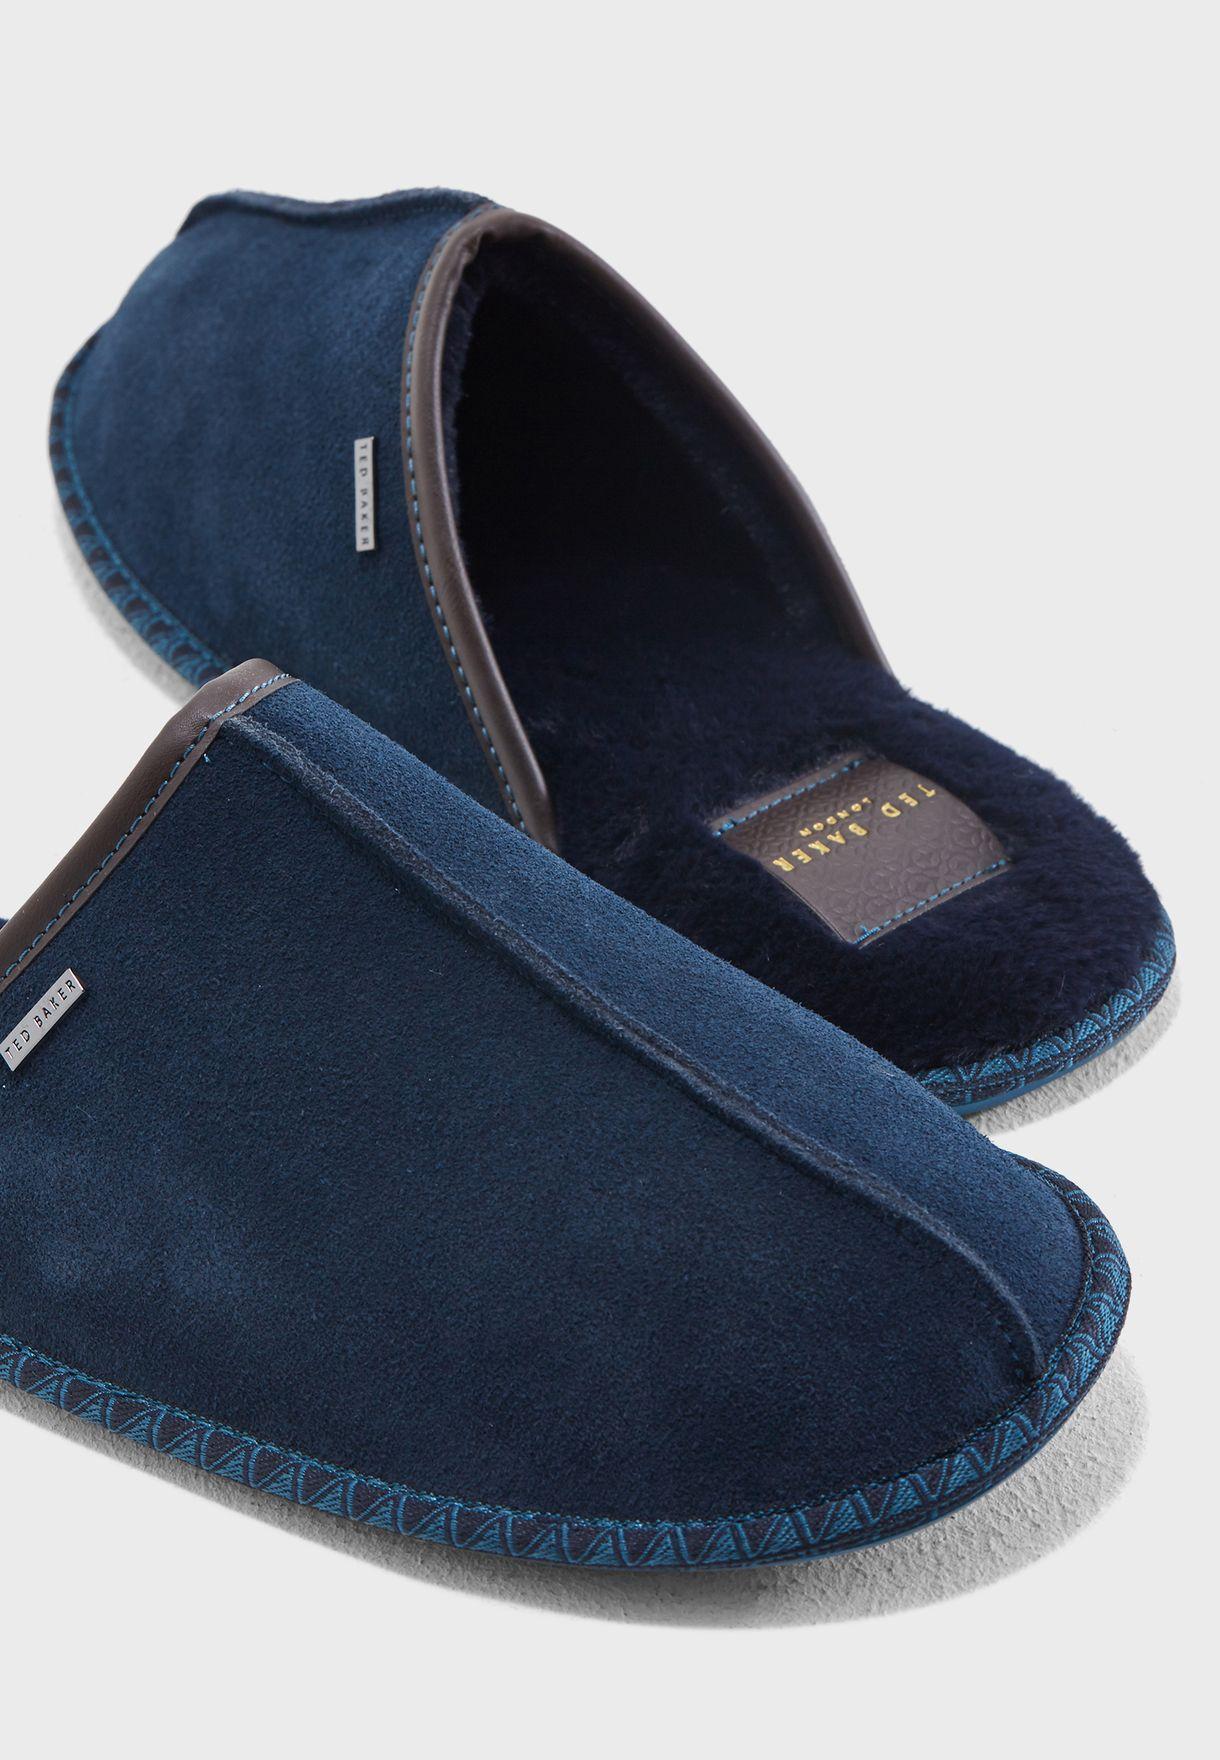 Buy Ted Baker Navy Parick Bedroom Slippers For Men In Mena Worldwide 9 17683